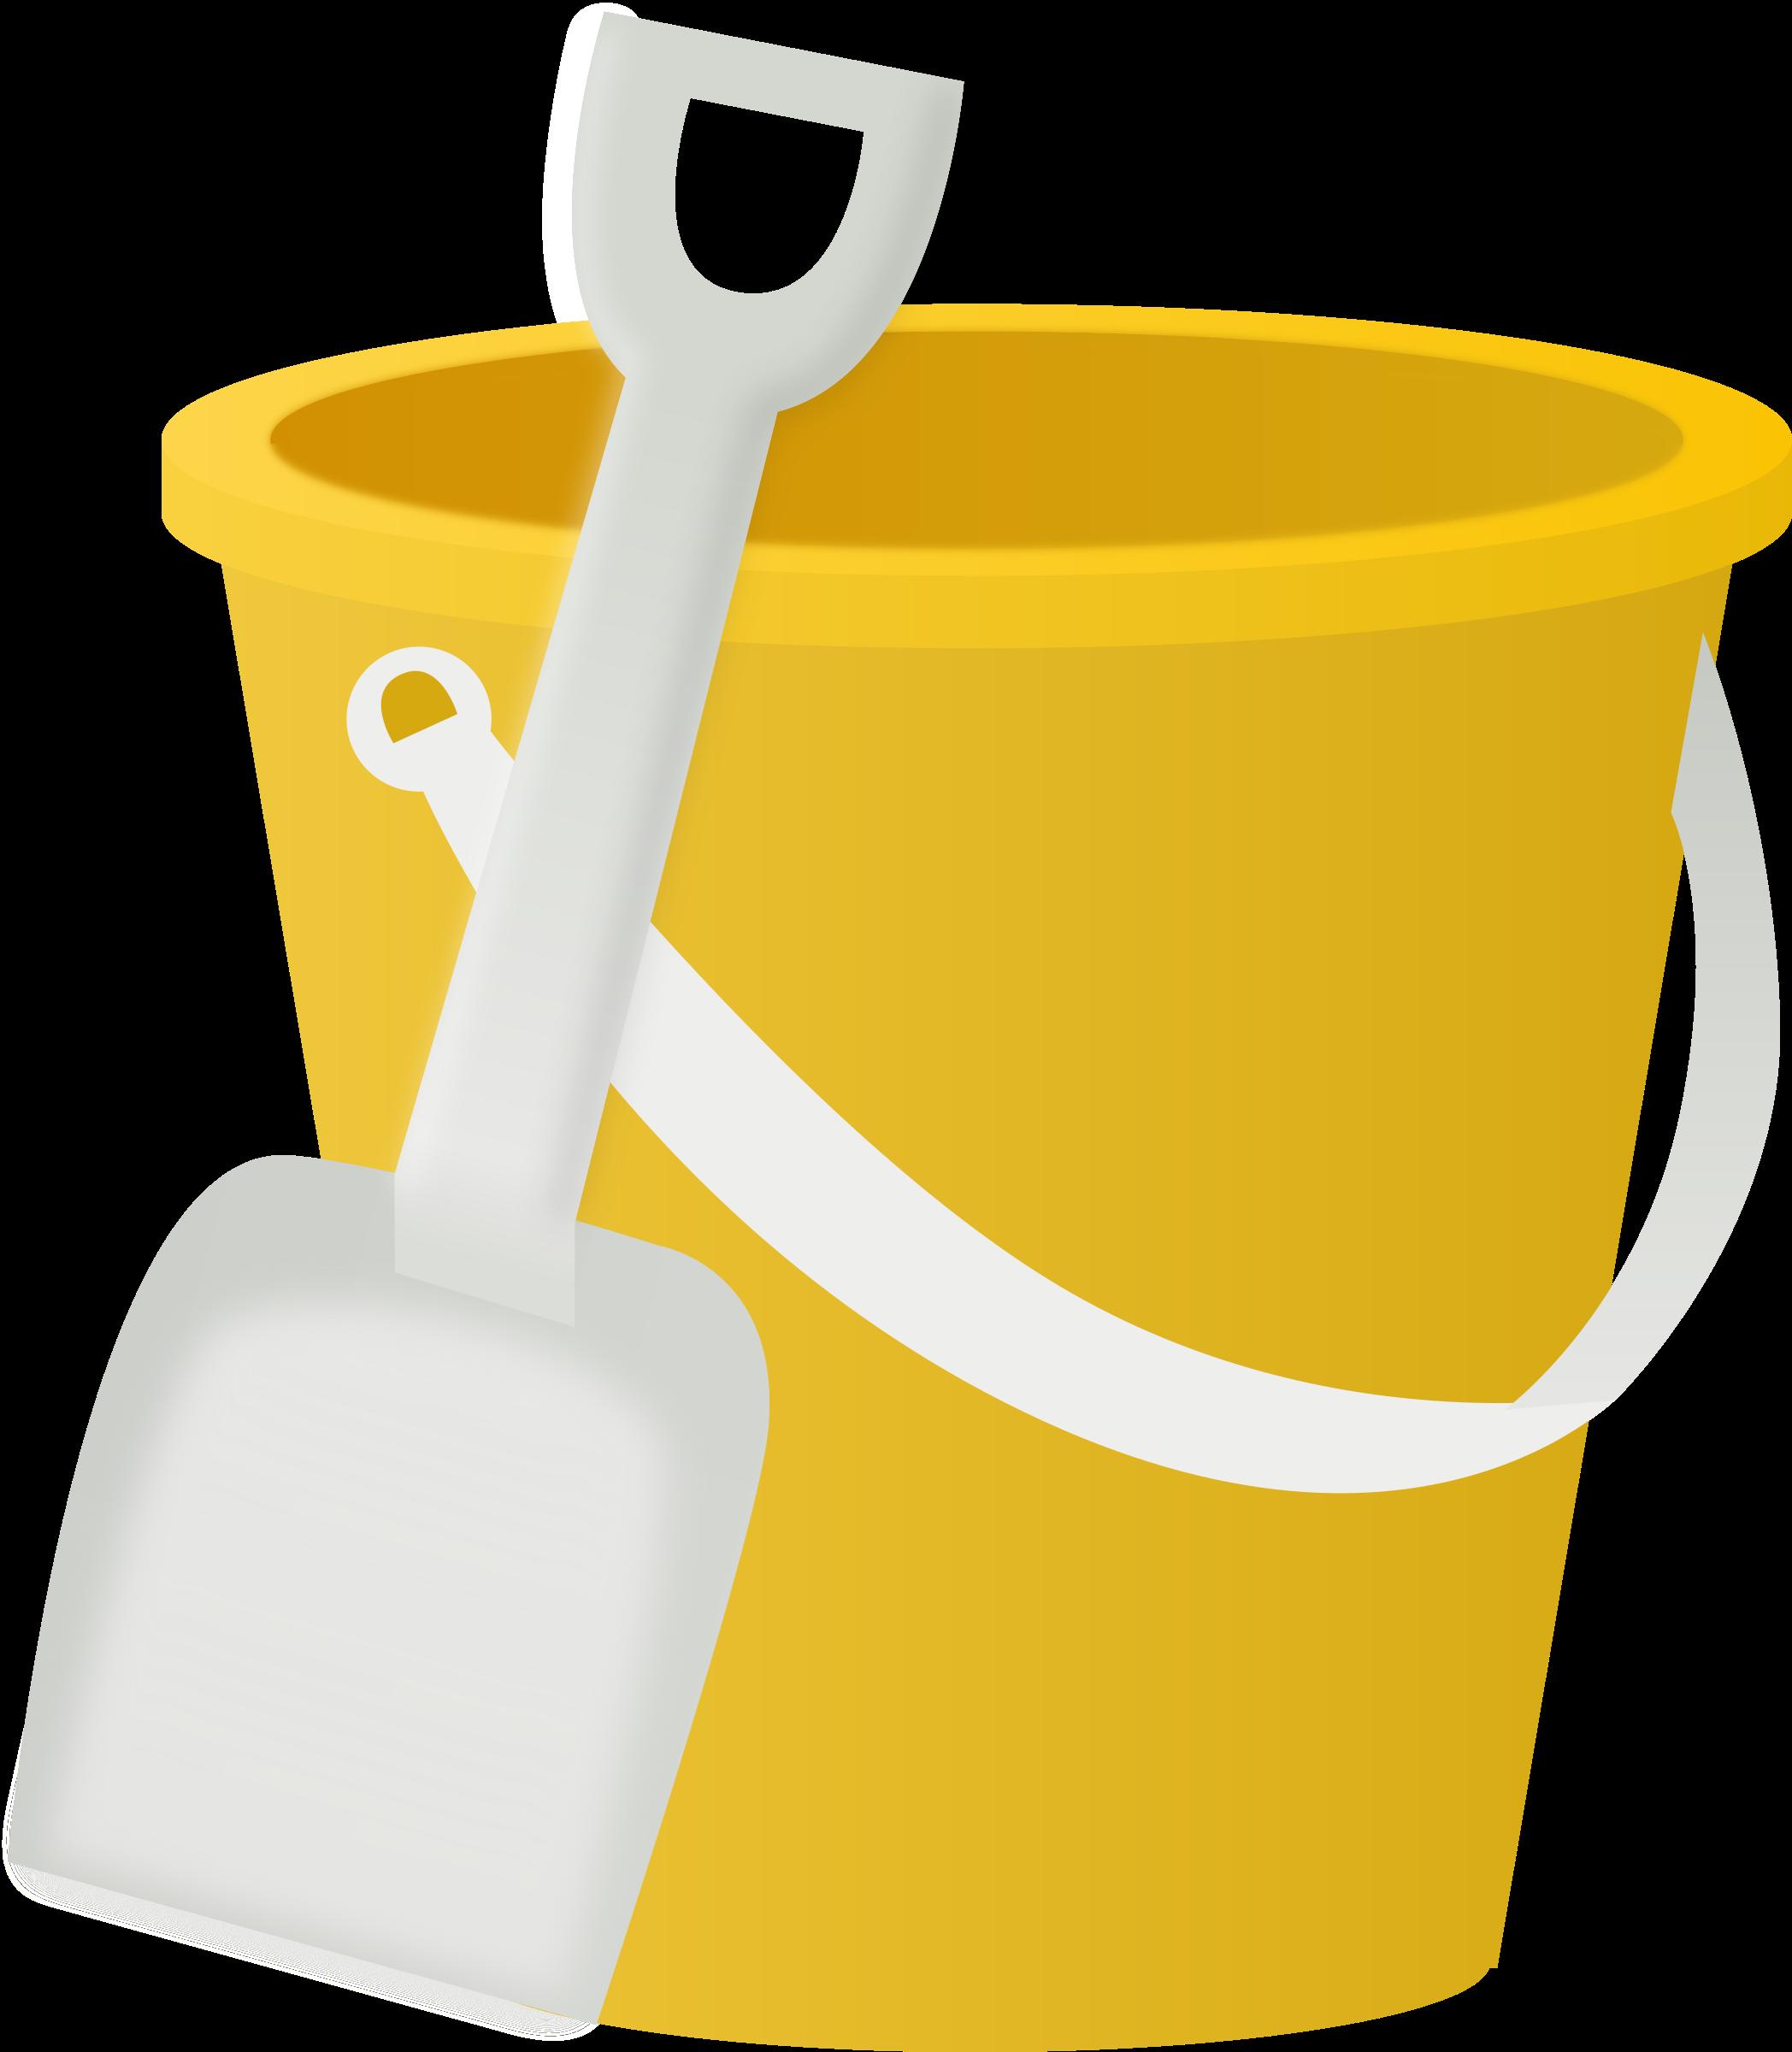 Bucket clipart sand bucket. Big image png